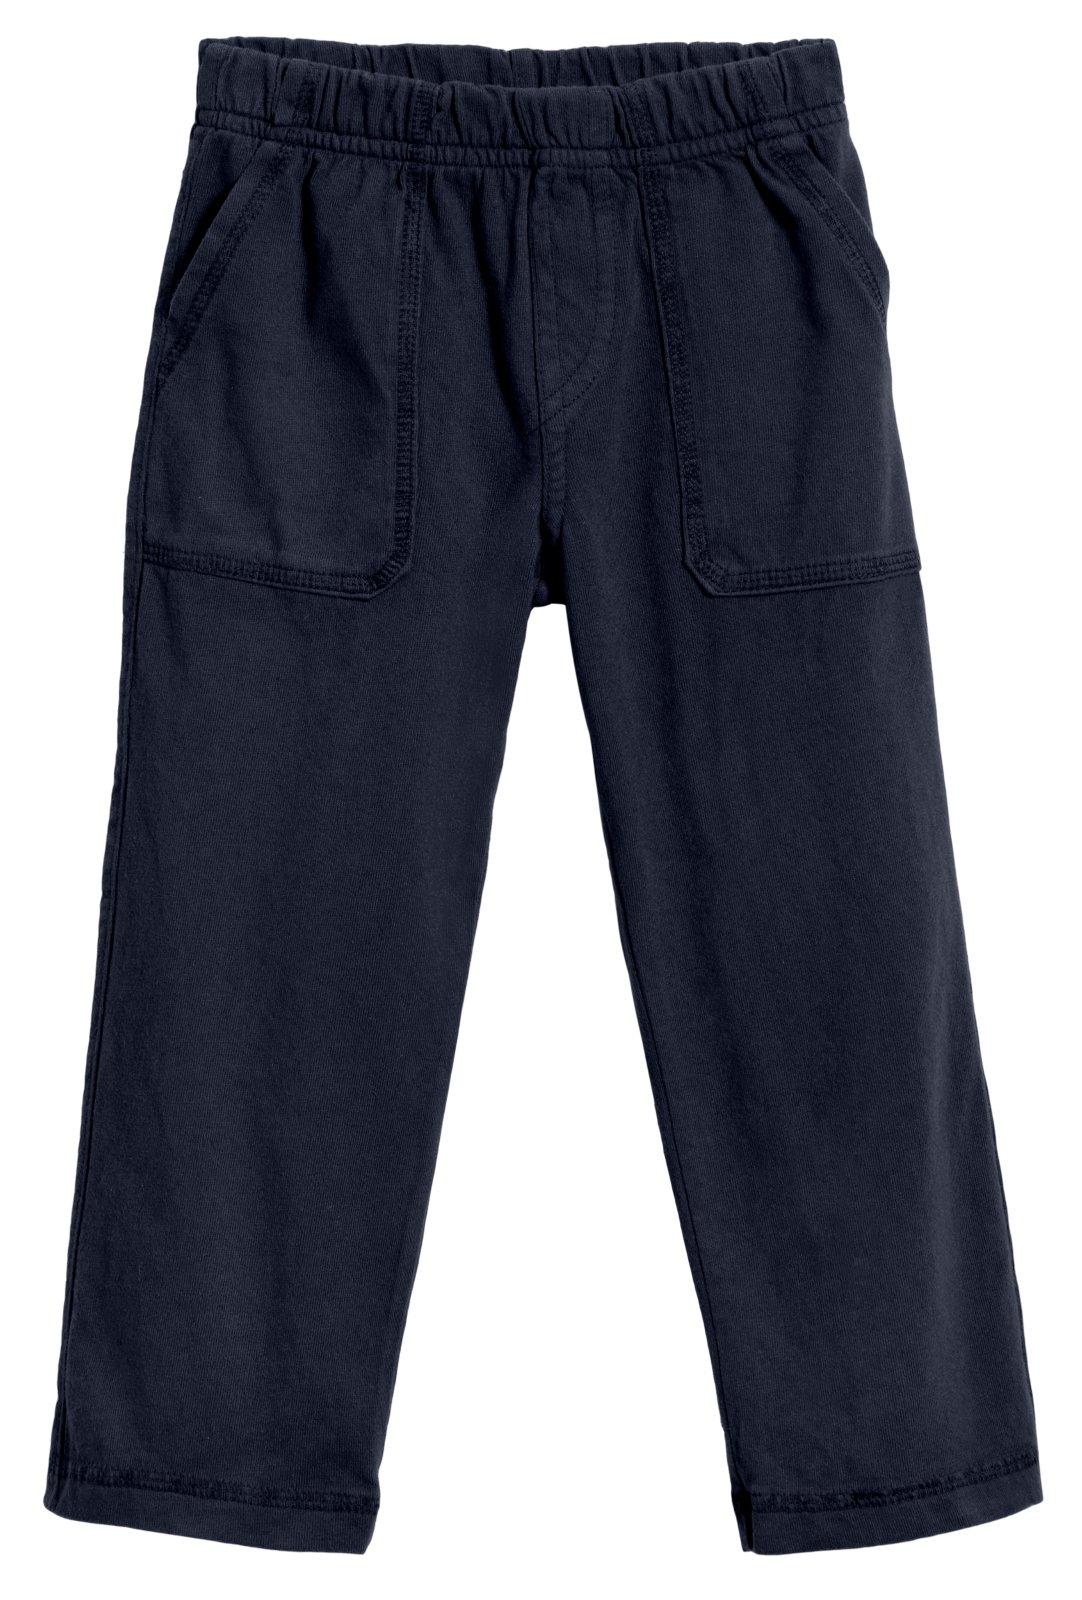 City Threads Big Boys' and Girls' Soft Jersey Tonal Stitch Pant Perfect for Sensitive Skin SPD Sensory Friendly Clothing - Dark Navy 12